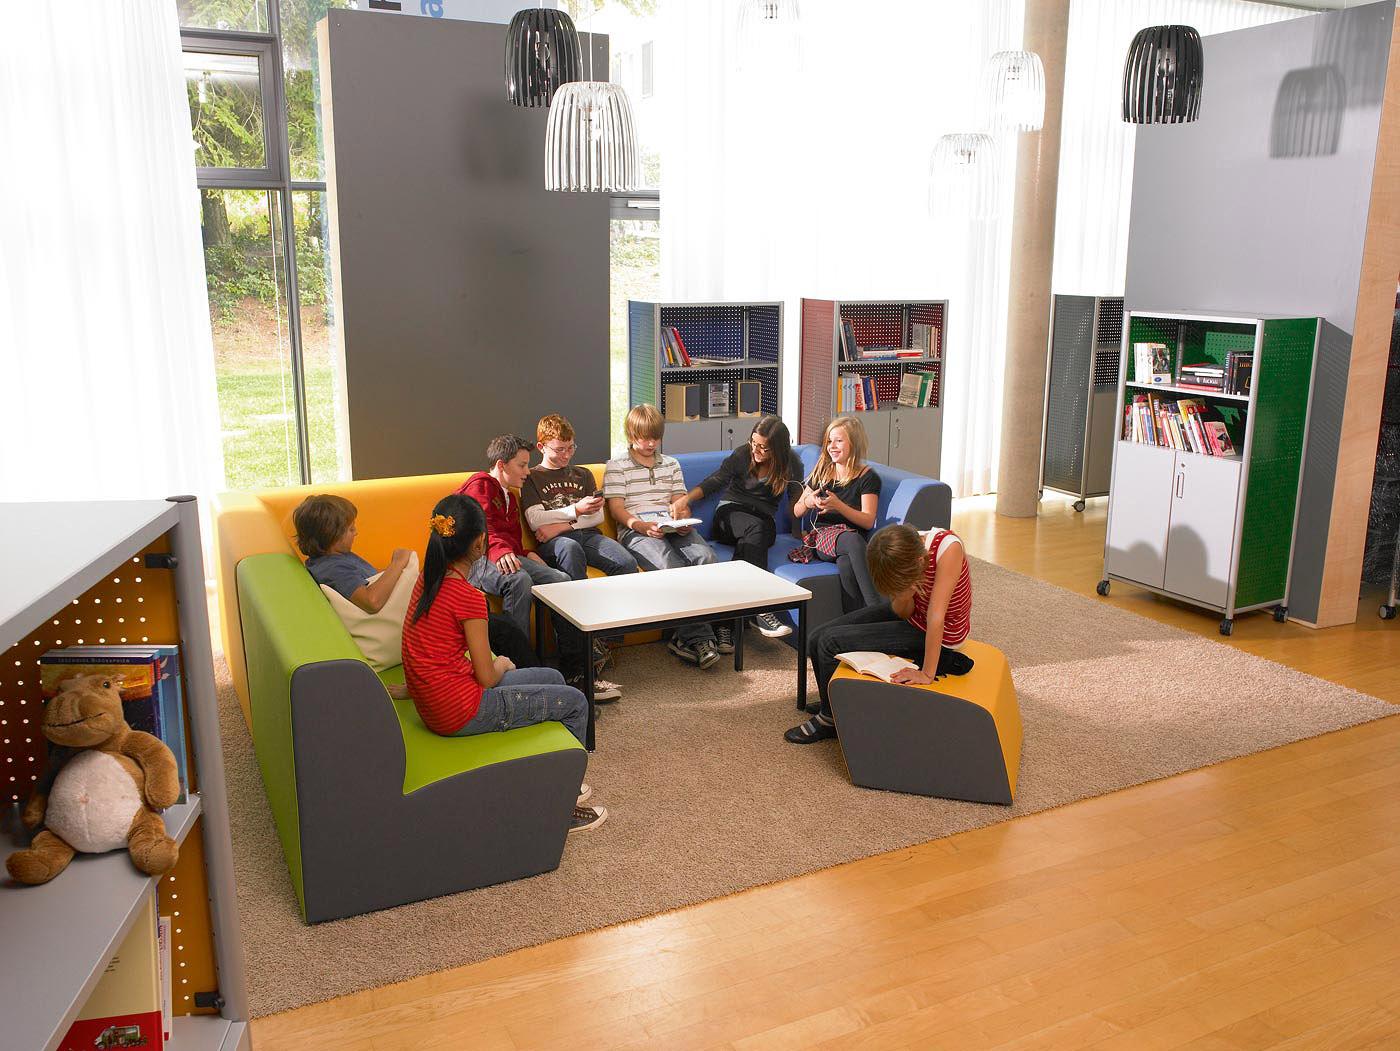 Vs meubles scolaires ergonomiques for Arredi biblioteche